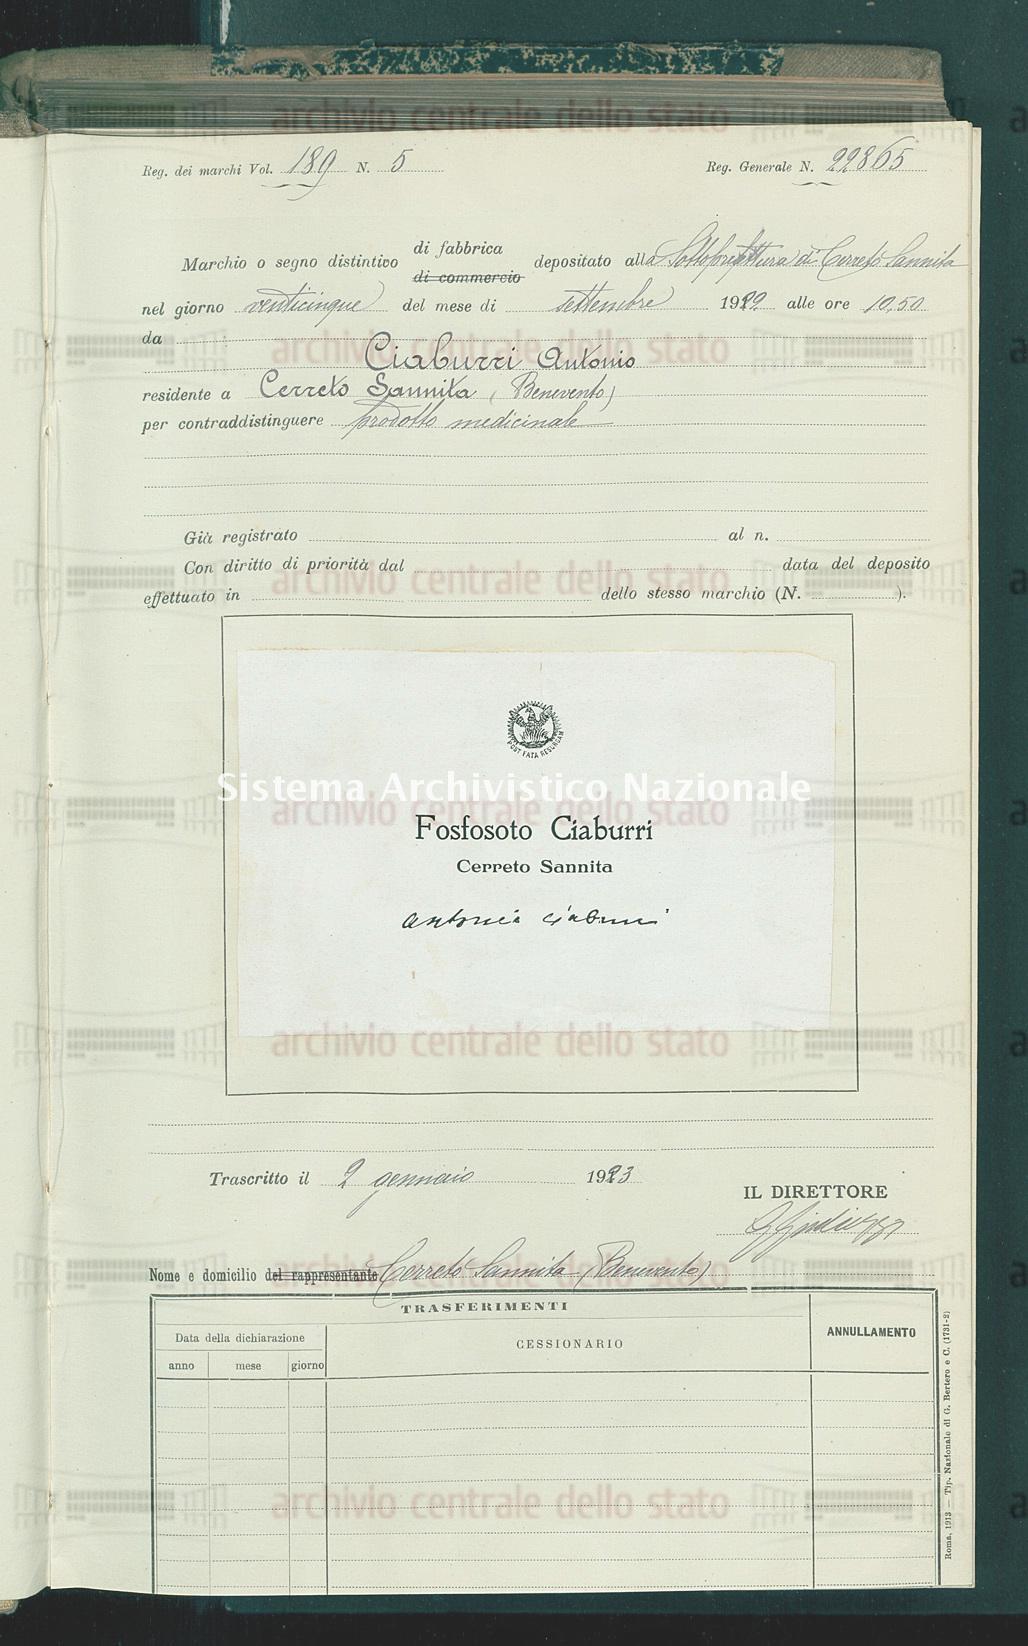 Ciaburri Antonio (02/01/1923)